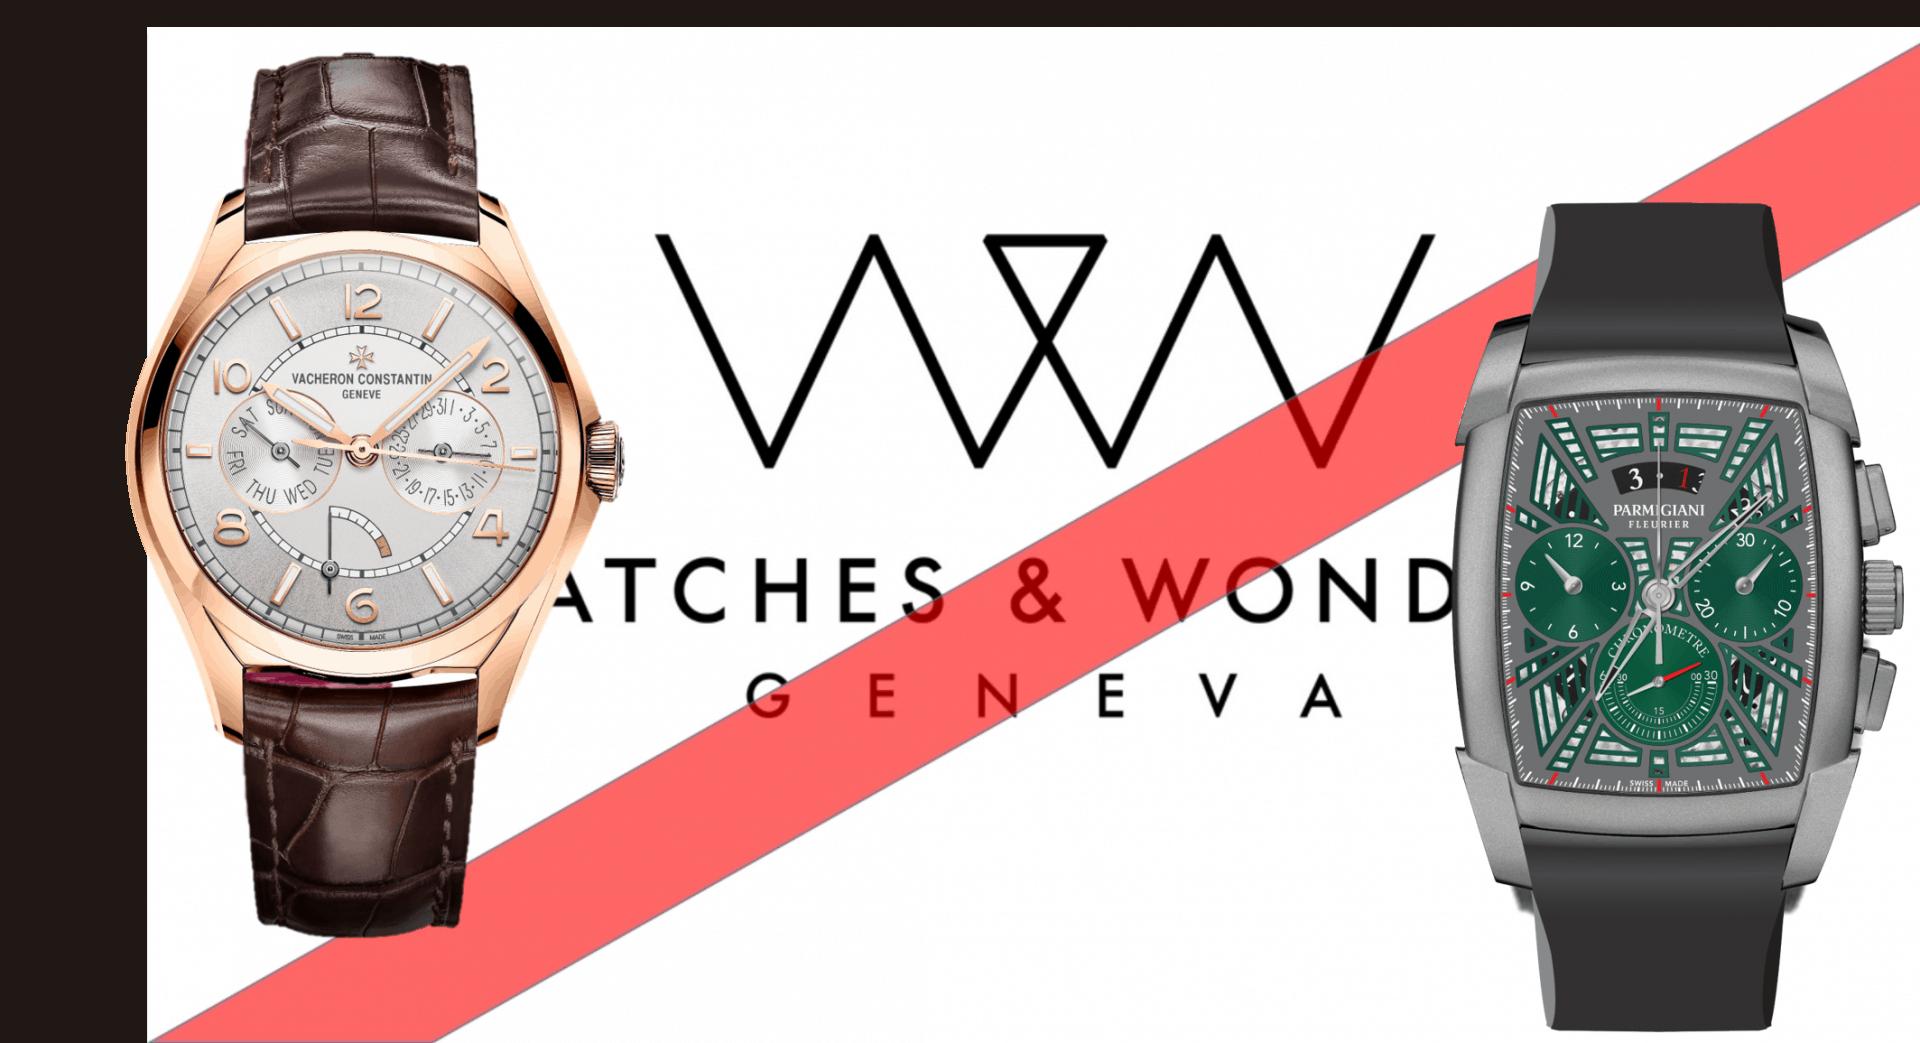 Genfer Uhrenmesse Watches & Wonders Corona! Genfer Uhrensalon Watches & Wonders 2020 ist abgesagt